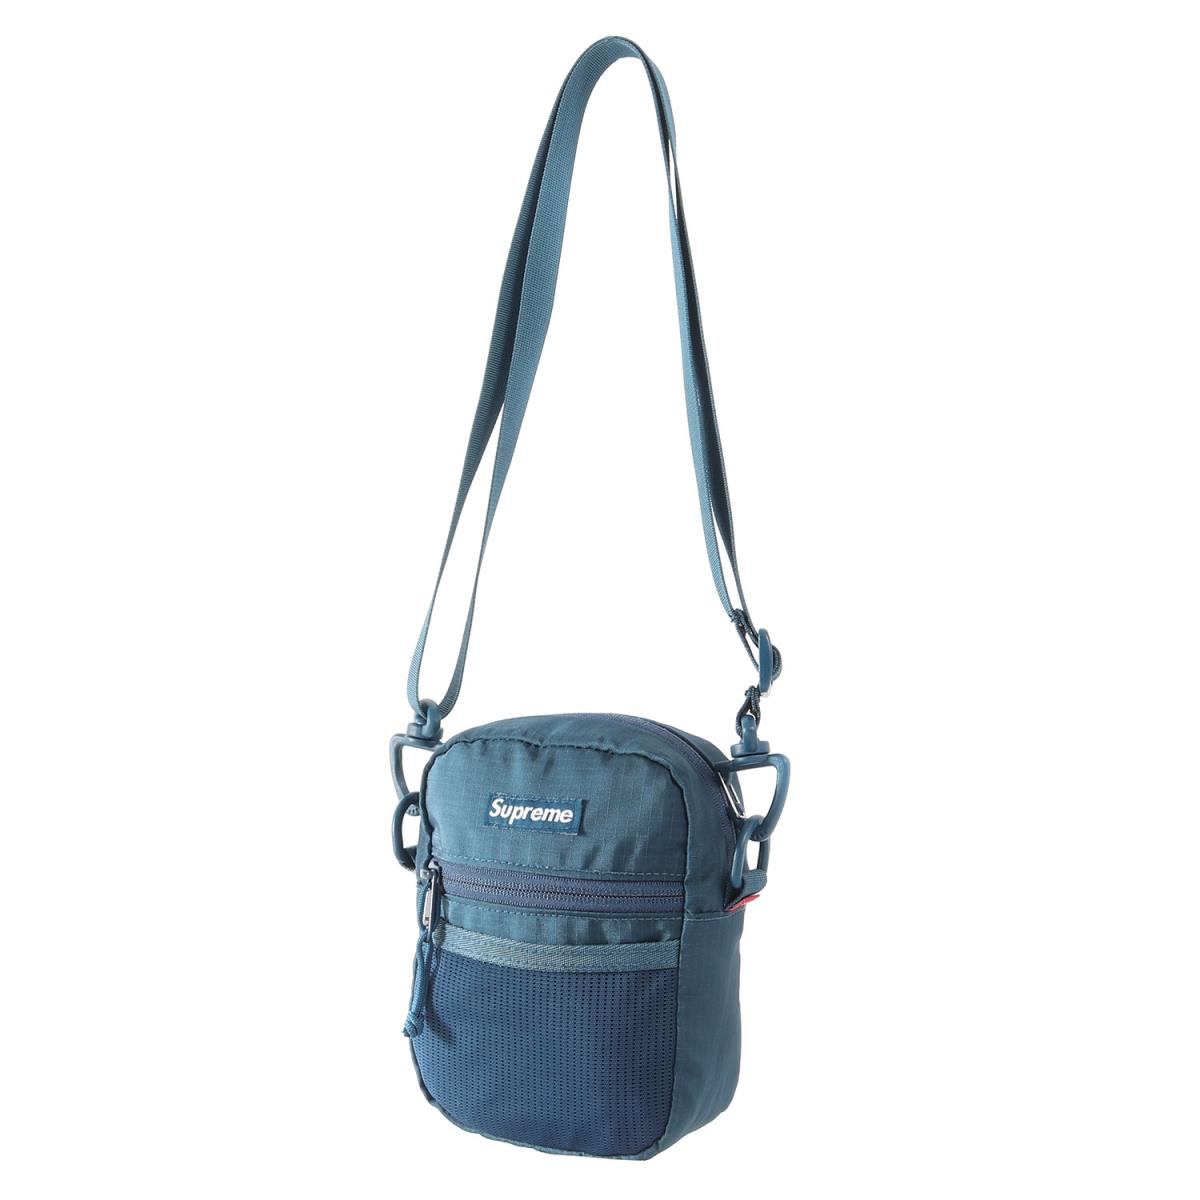 Supreme (シュプリーム) 17S/S ブランドロゴコーデュラリップストップナイロンショルダーバッグ(Small Shoulder Bag) ティール 【メンズ】【美品】【K2240】【中古】【あす楽☆対応可】